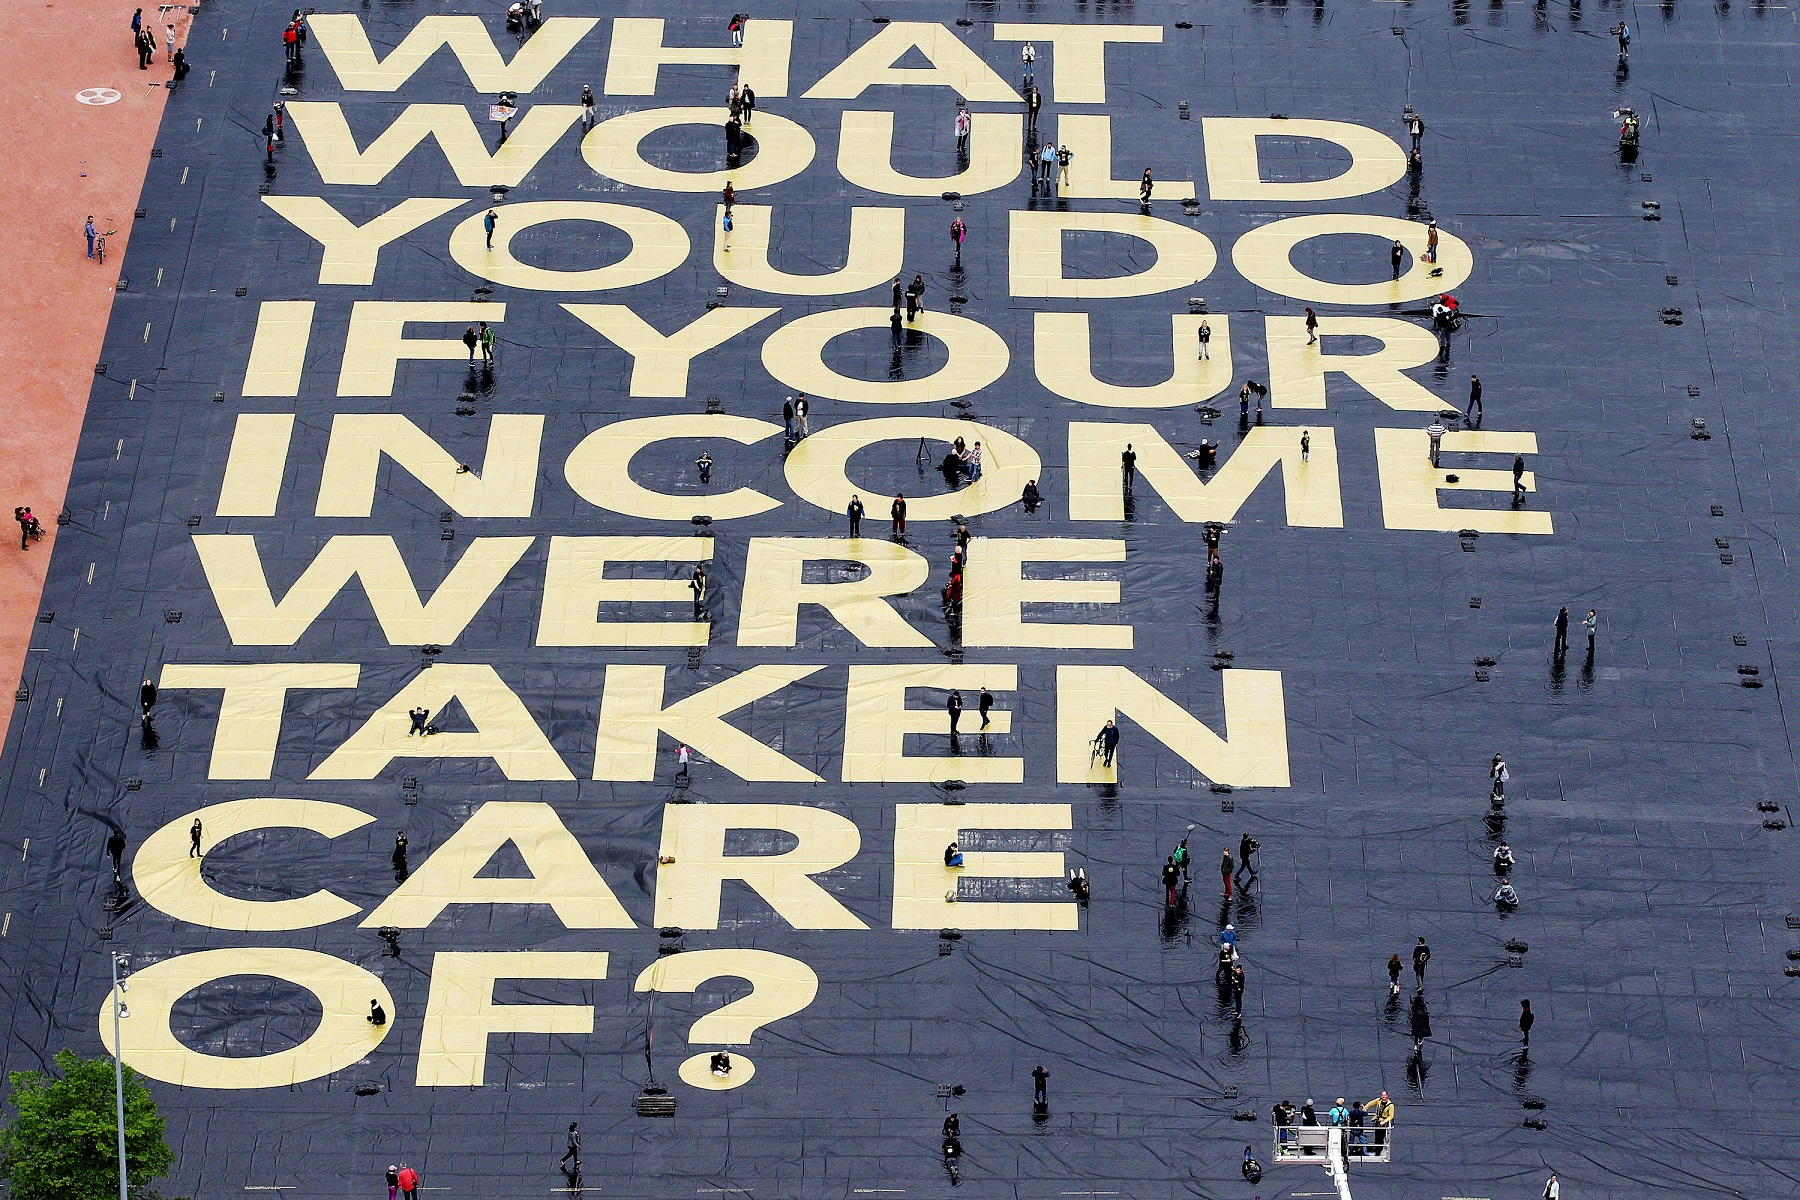 61400969-basic-income-poster-dpa.jpg